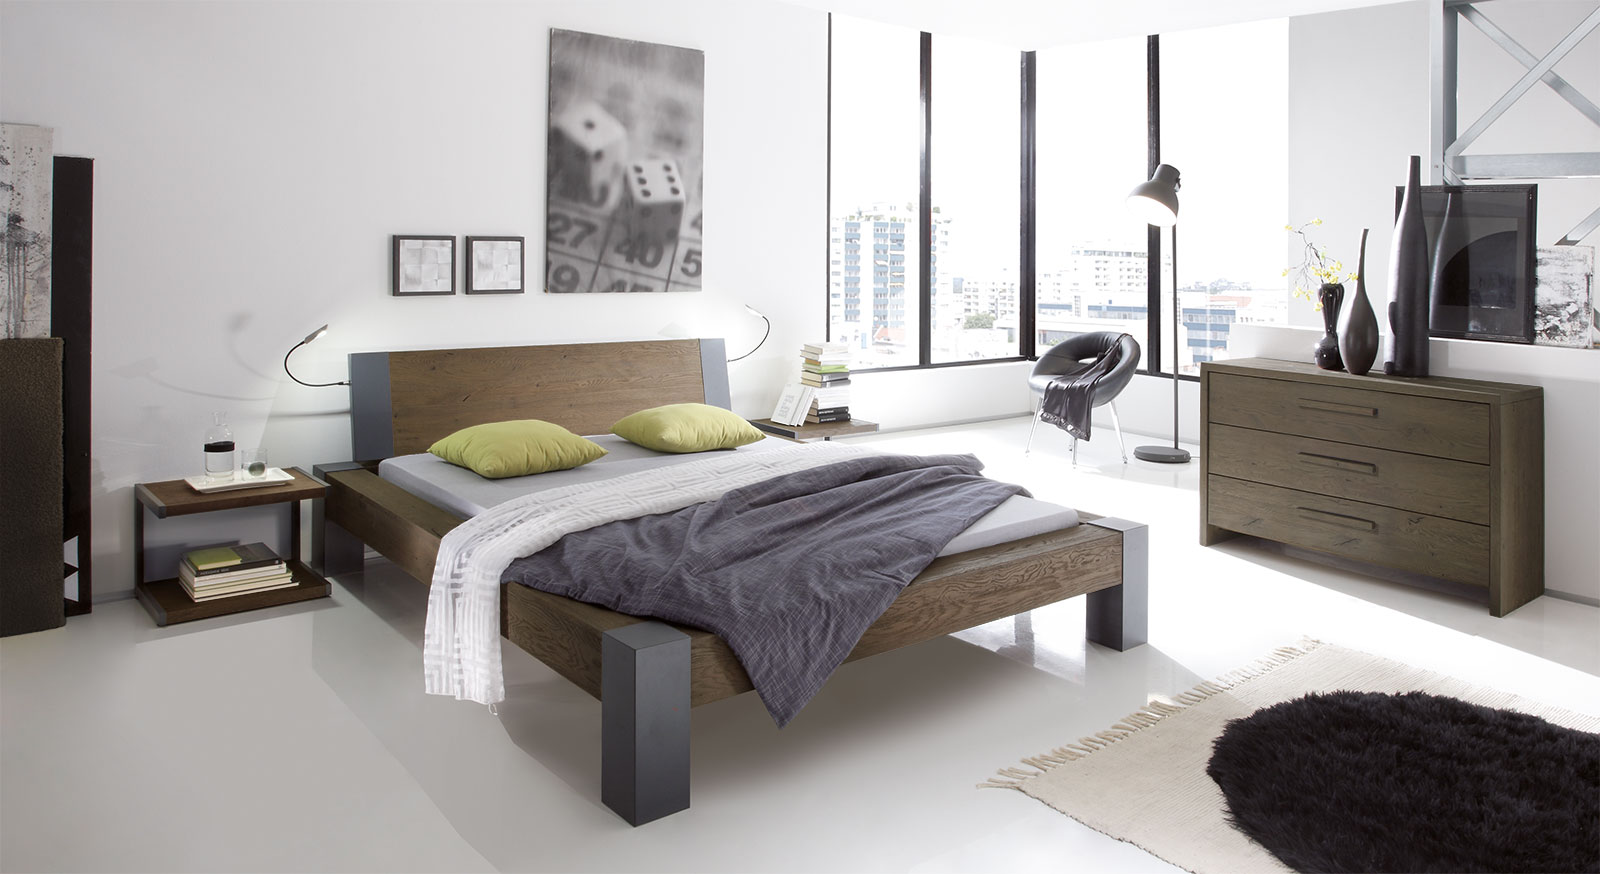 100 bett 160x200 holz tolle vollholz massivholz. Black Bedroom Furniture Sets. Home Design Ideas